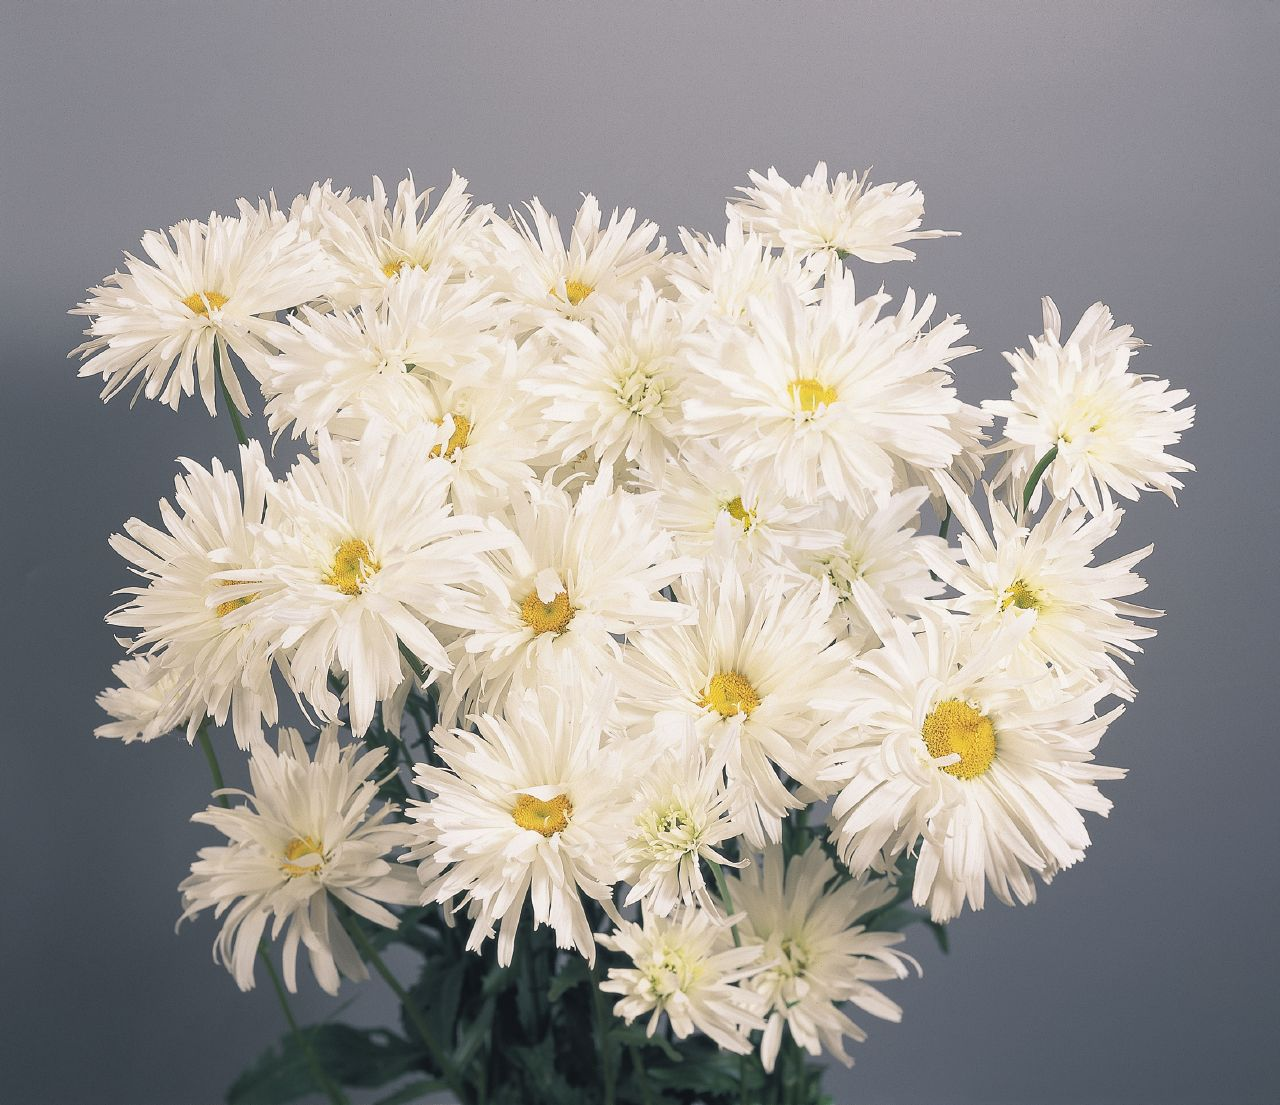 Shasta Daisy (Leucanthemum) Crazy Daisy Plug Flat